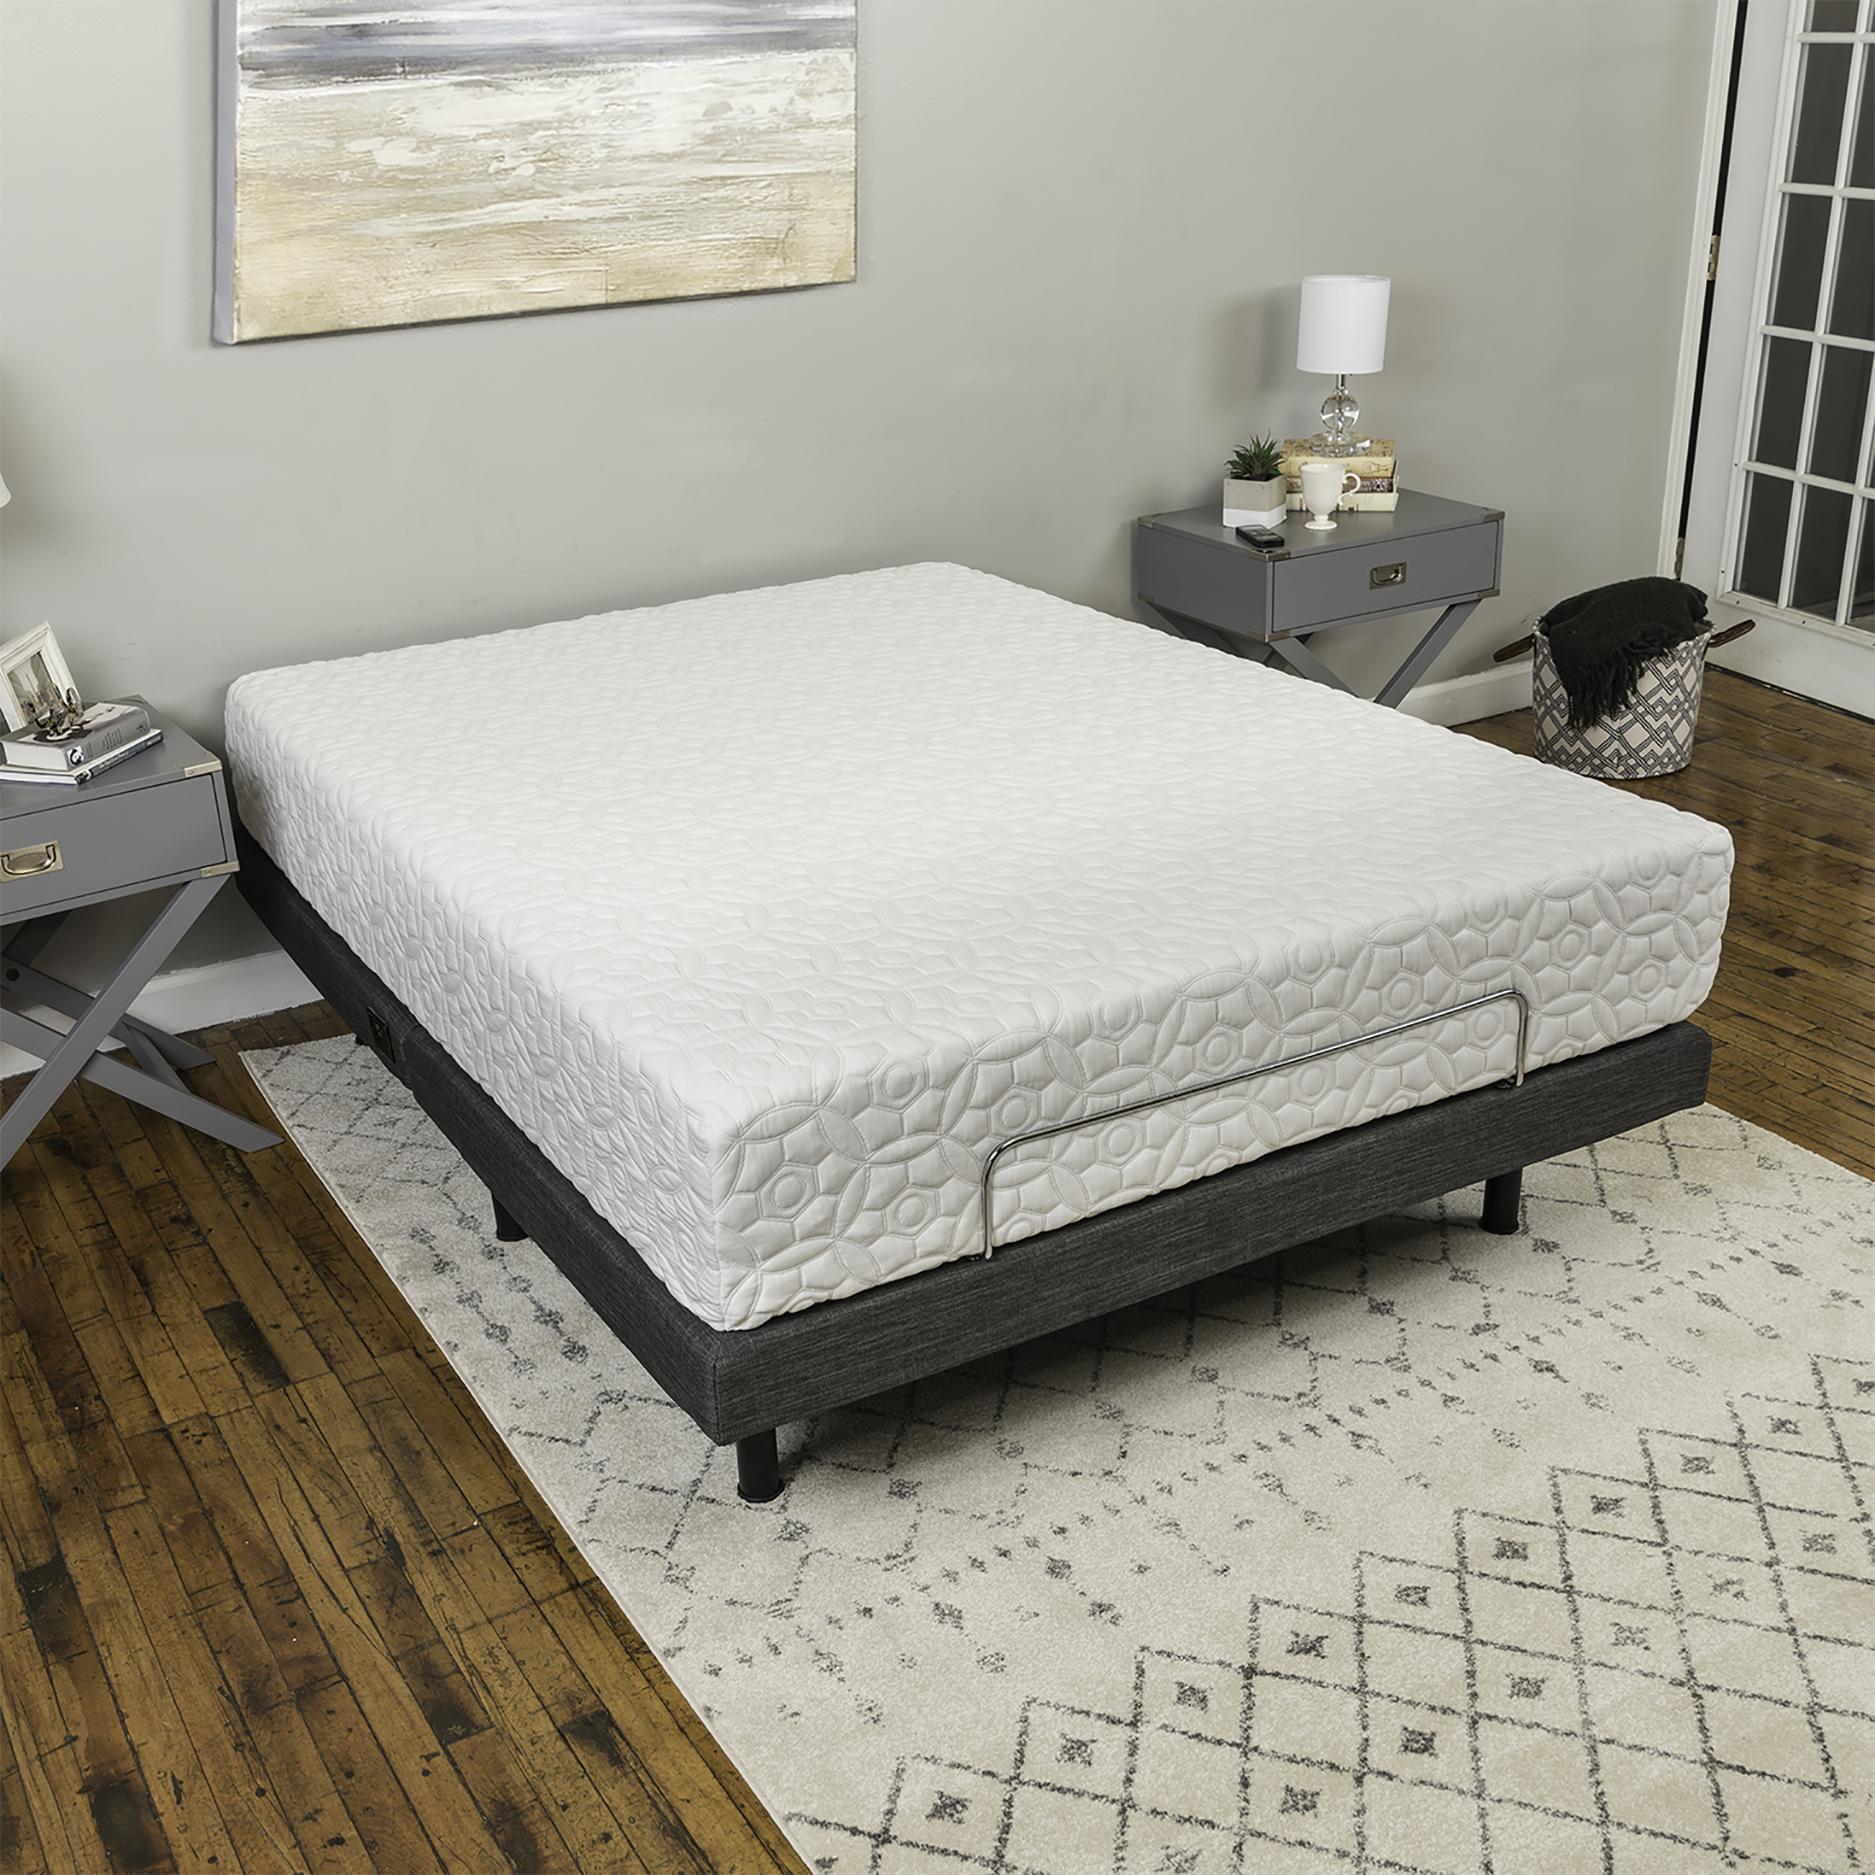 Modern Sleep Adjustable Comfort Adjustable Bed Base with Massage